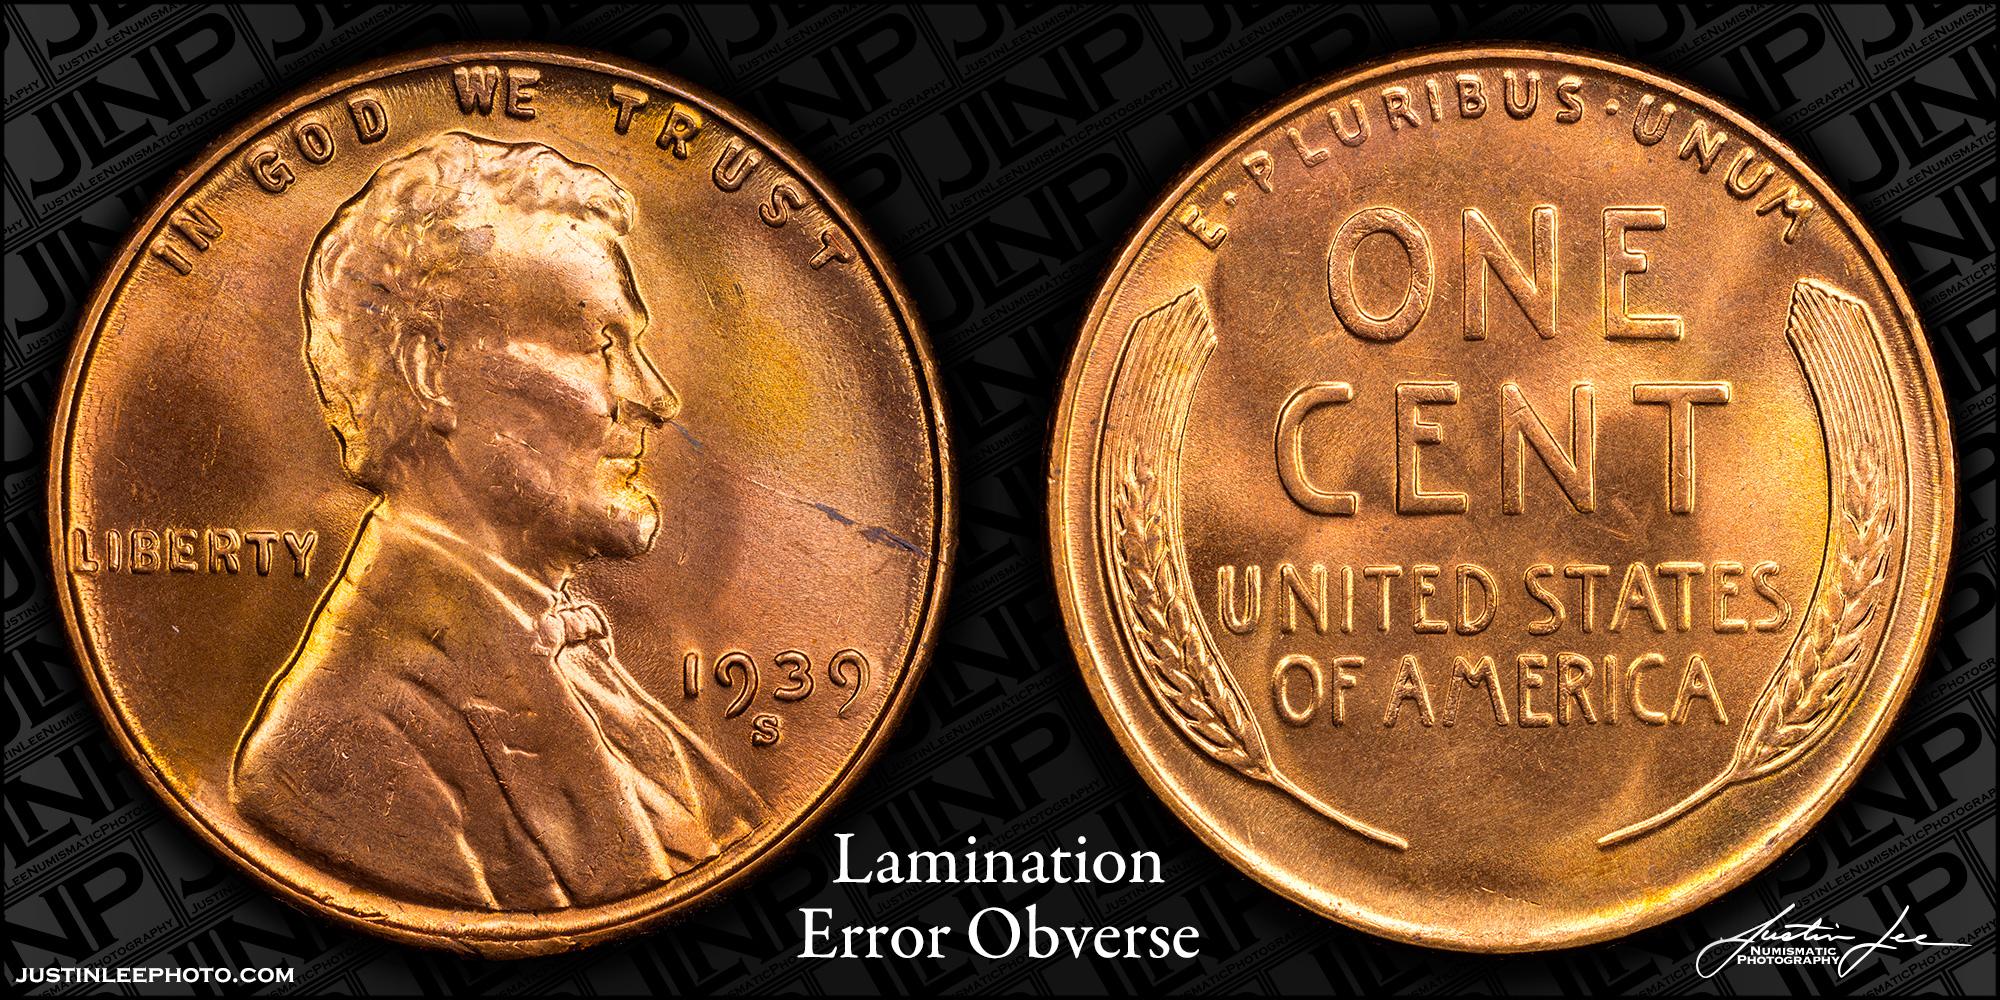 1939-S Lincoln Cent Obverse Lamination Error Raw